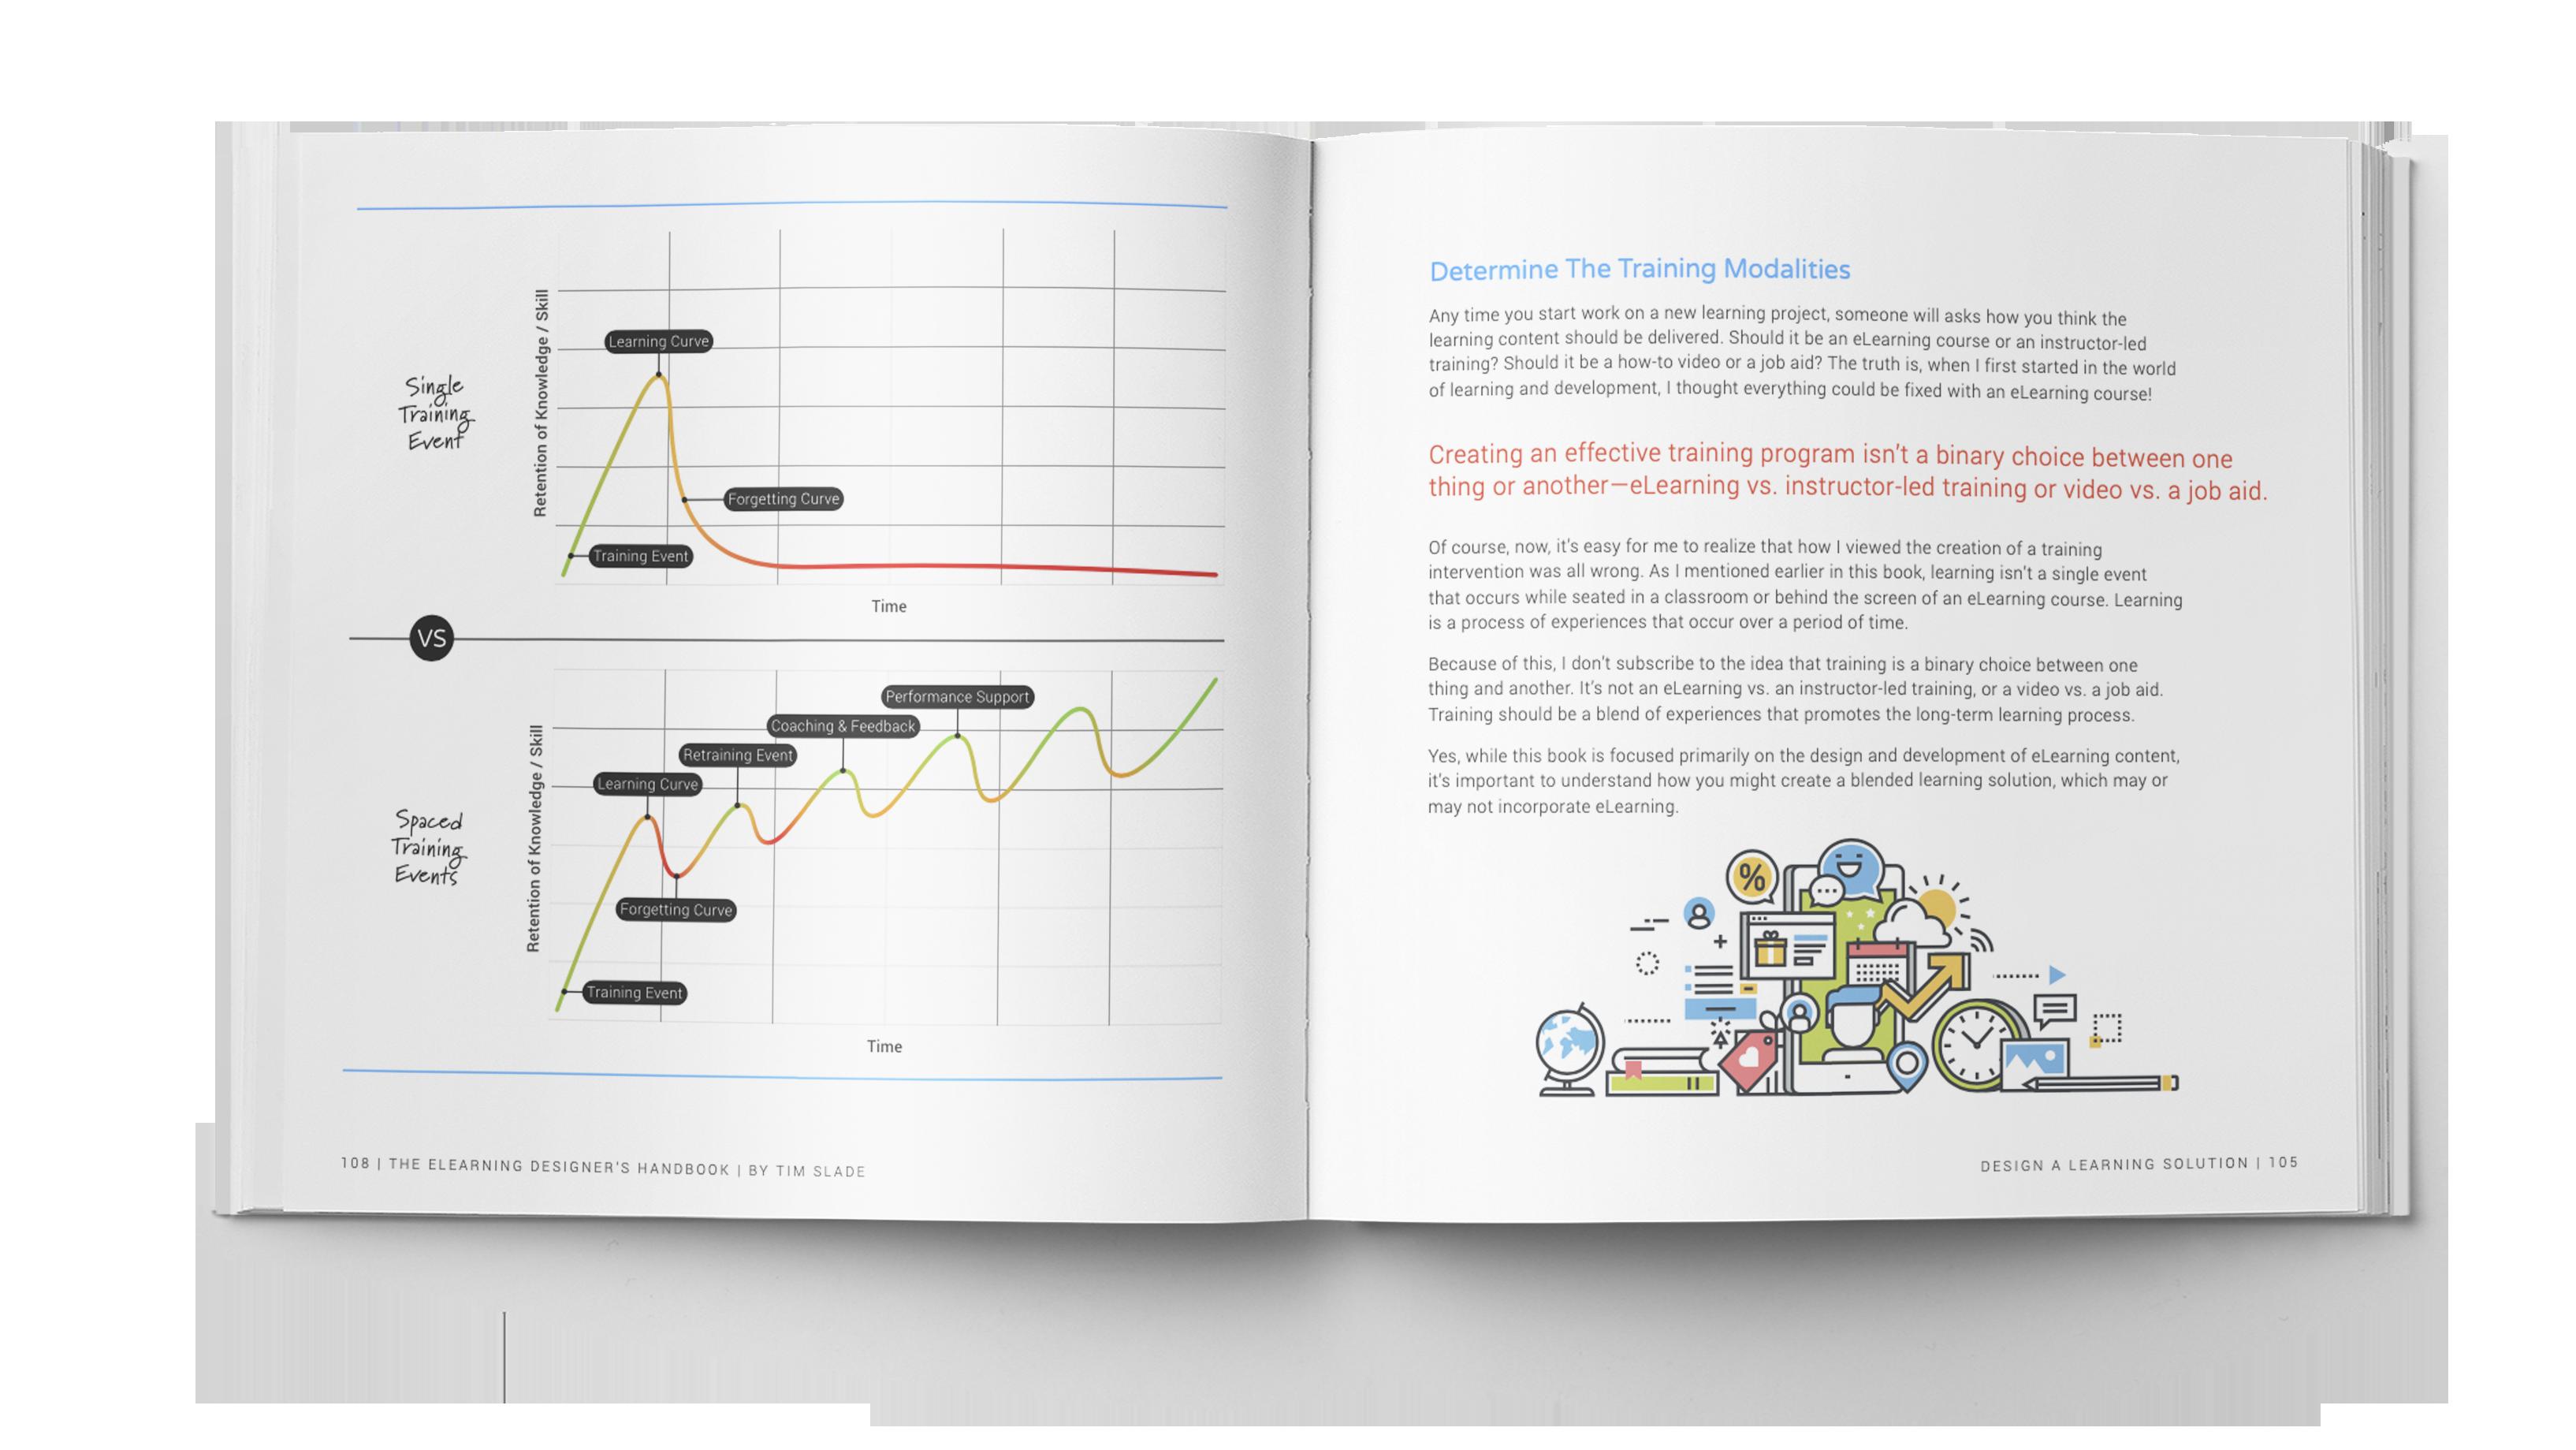 The eLearning Designer's Handbook by Tim Slade | Design a Learning Solution | Freelance eLearning Designer | The eLearning Designer's Academy